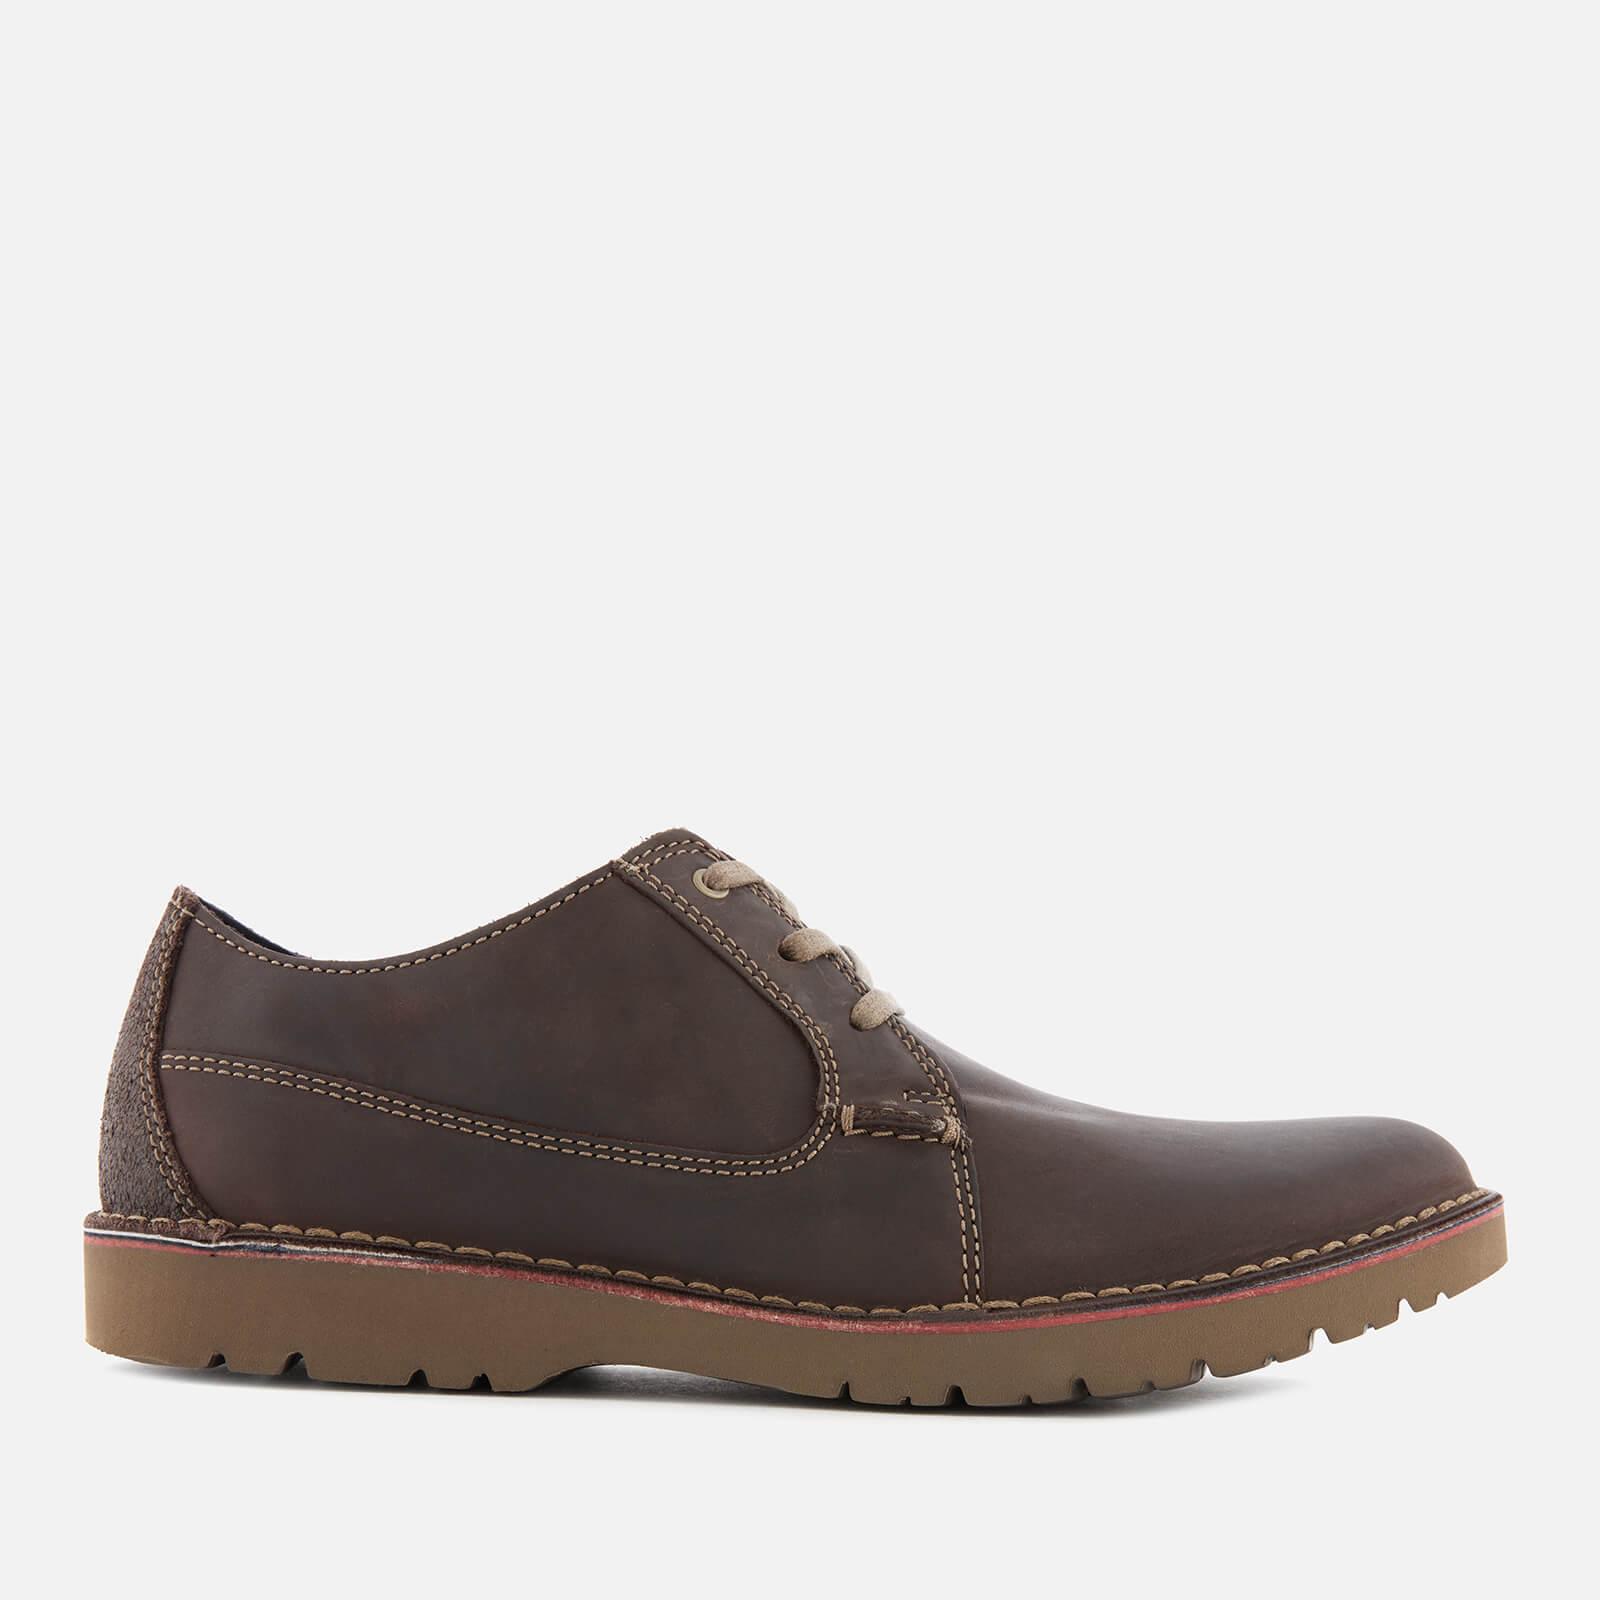 Clarks Men's Vargo Plain Leather Derby Shoes - Dark Brown - UK 10